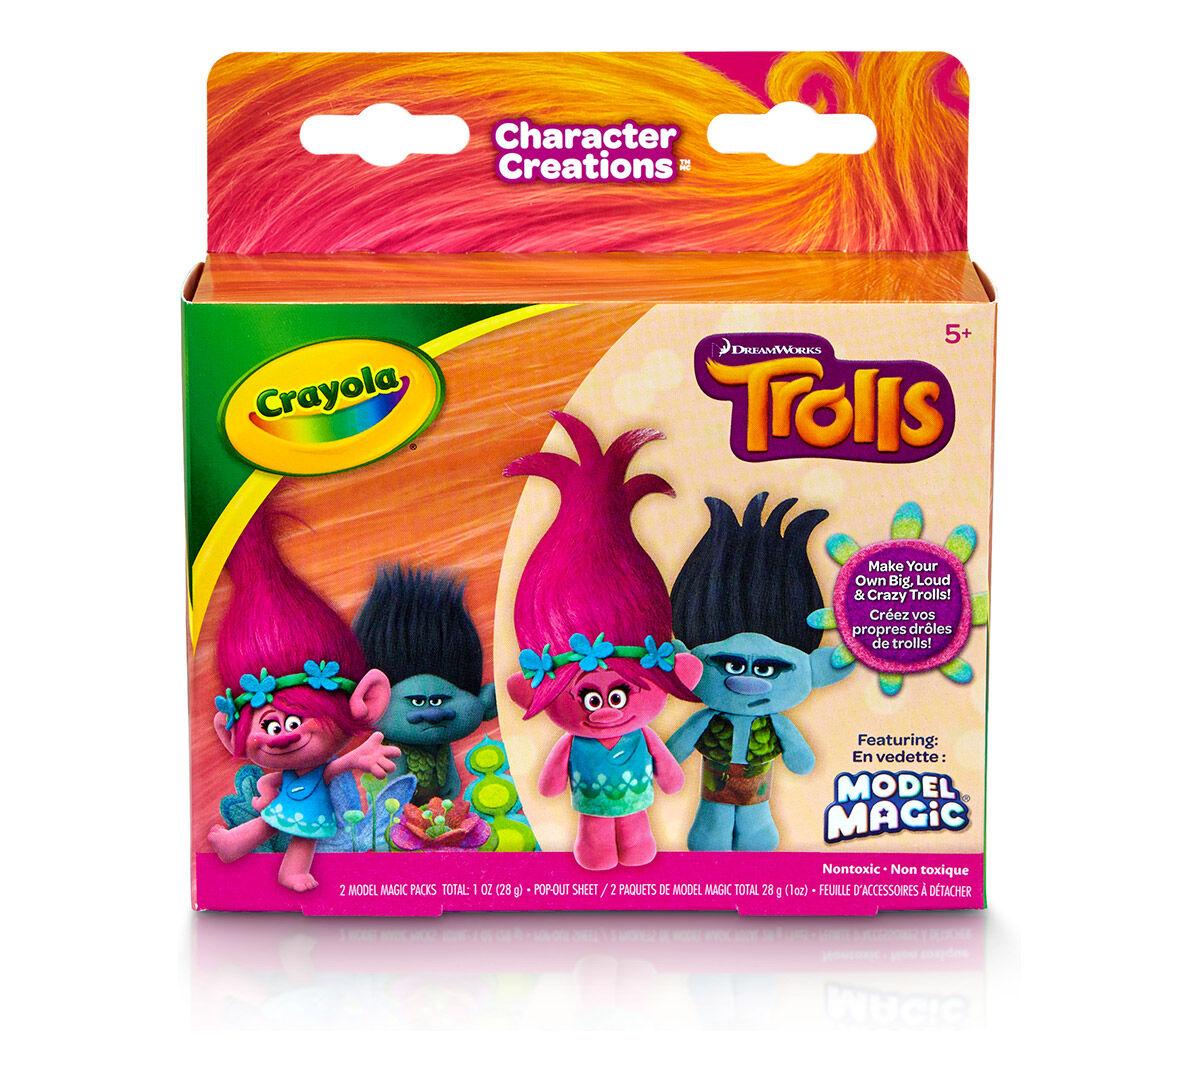 crayola model magic character creations trolls biggie u0026 branch